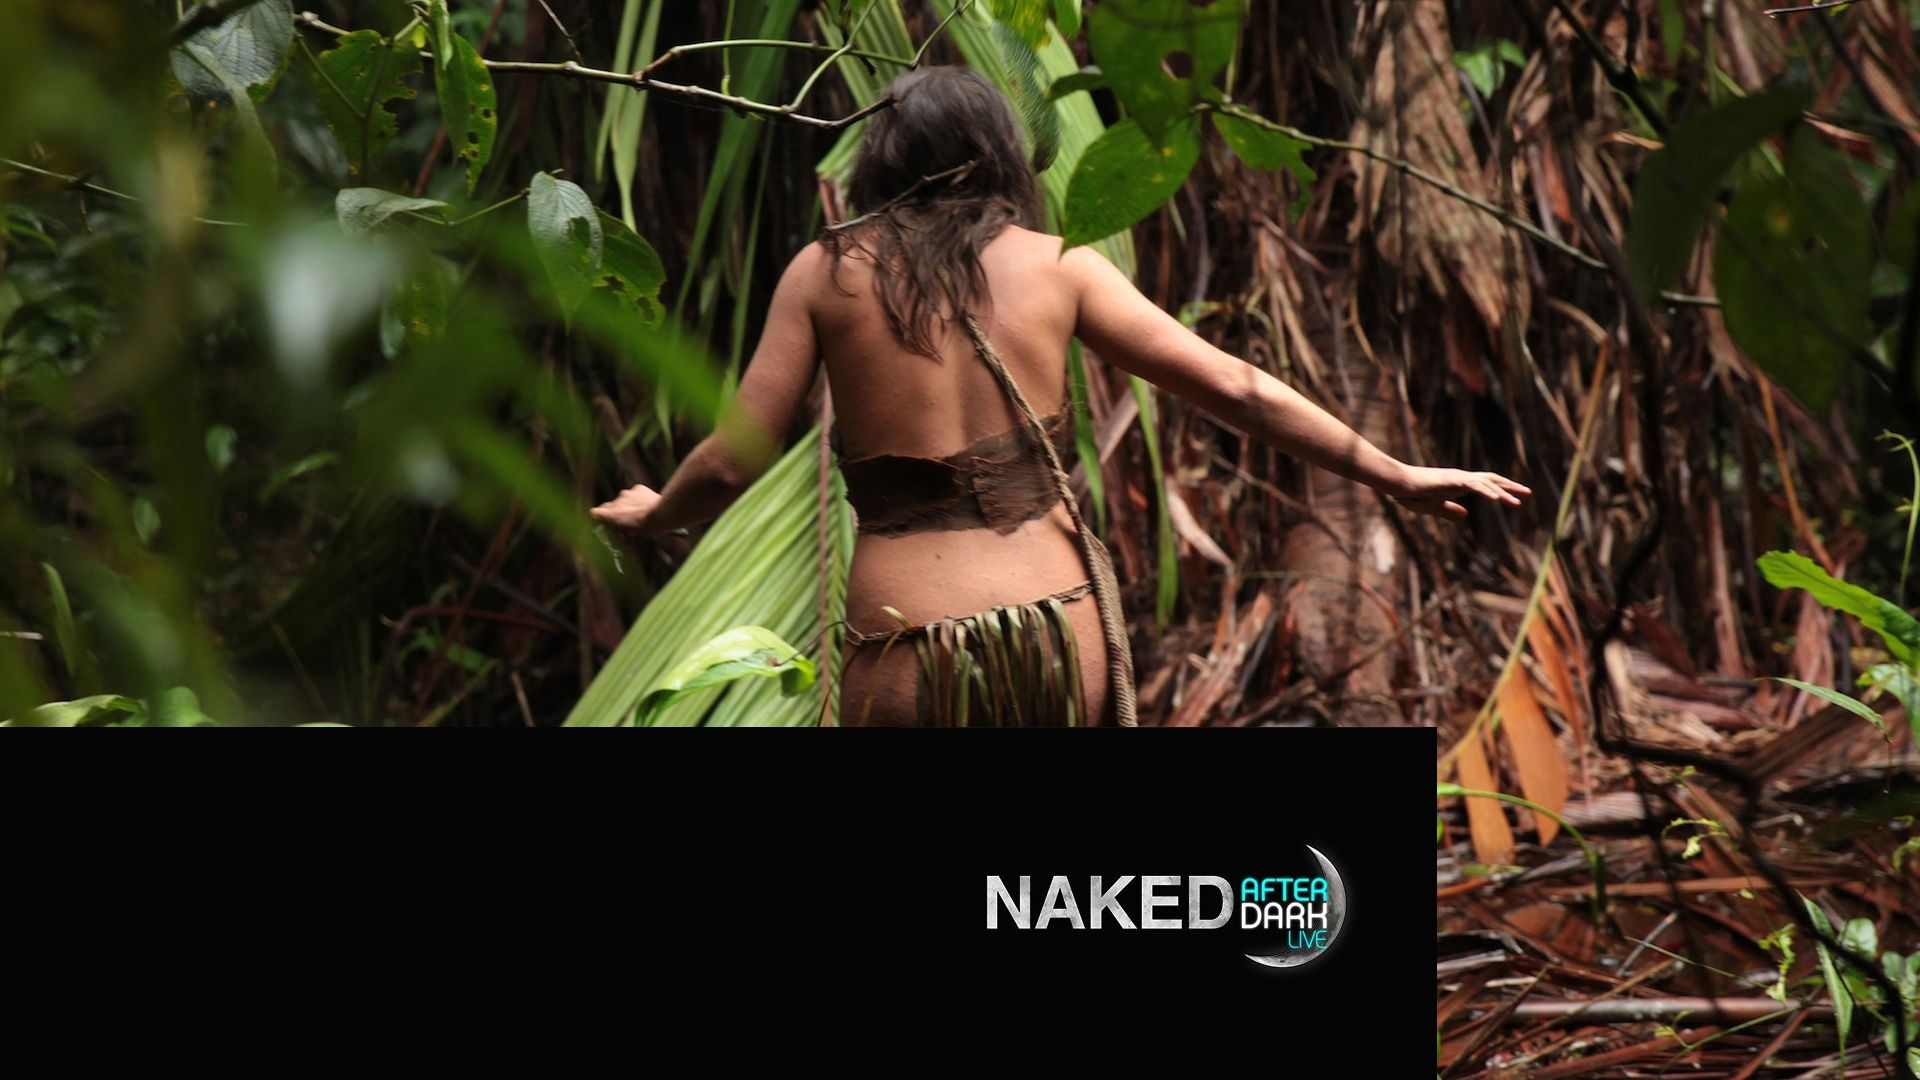 Season 01, Episode 01 After the Amazon